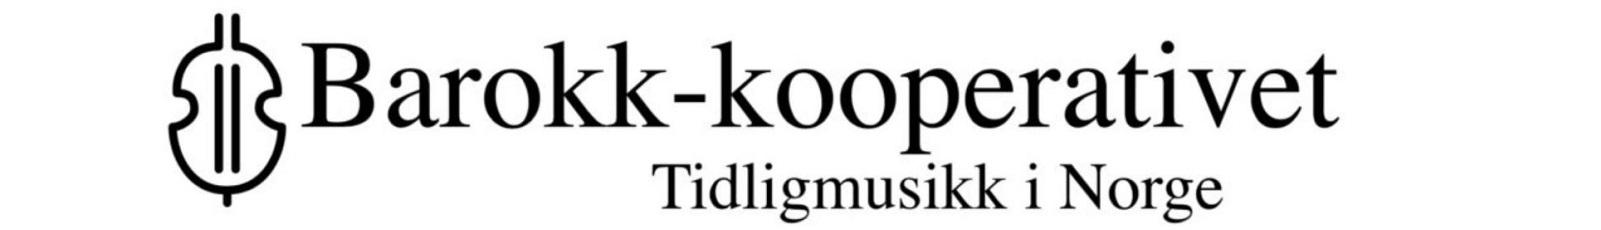 Barokk-kooperativet